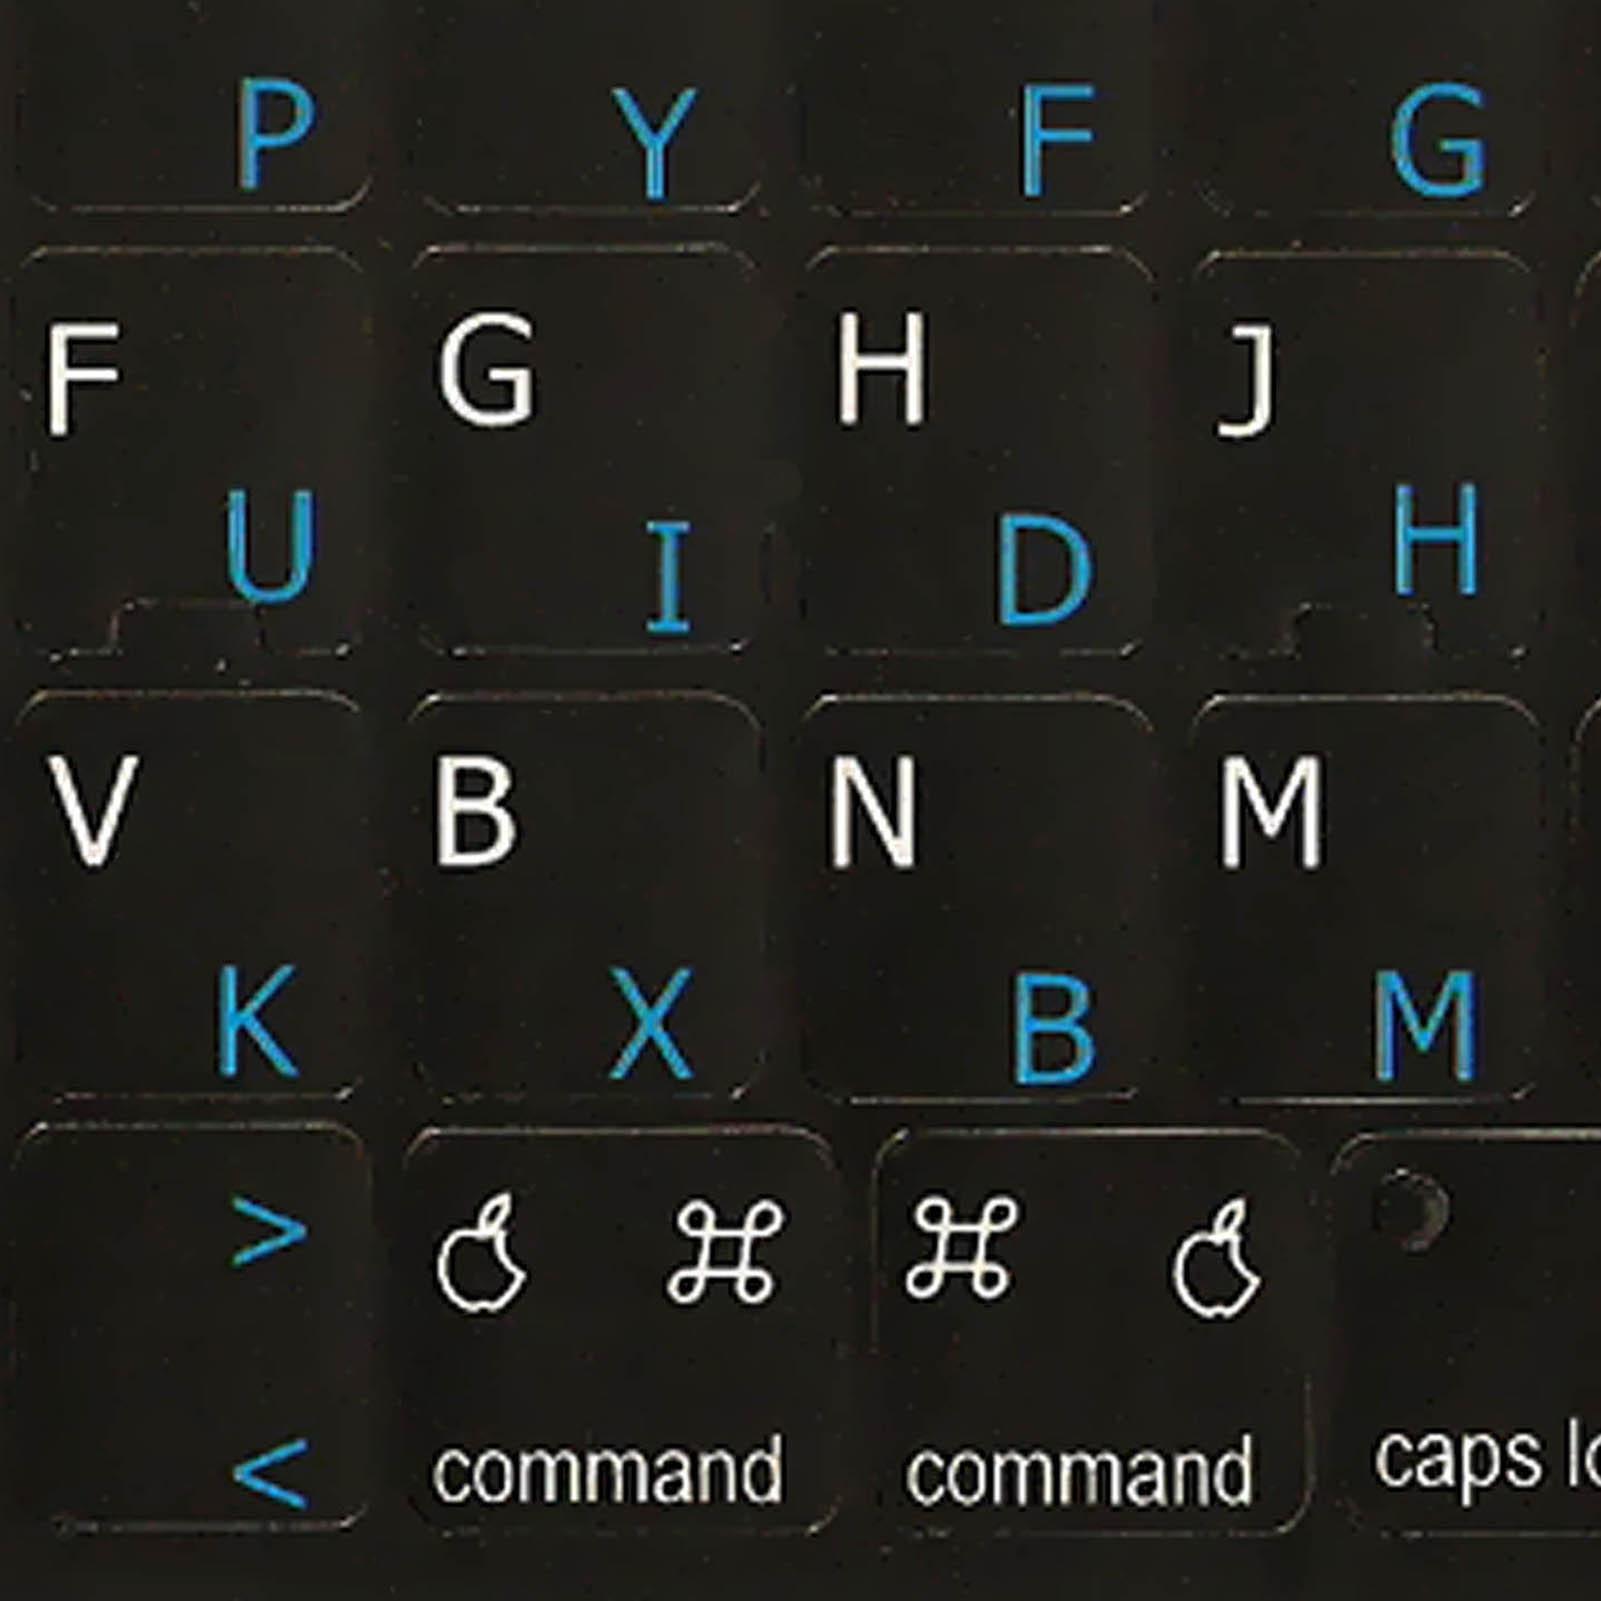 Dvorak-English for Mac keyboard labels black